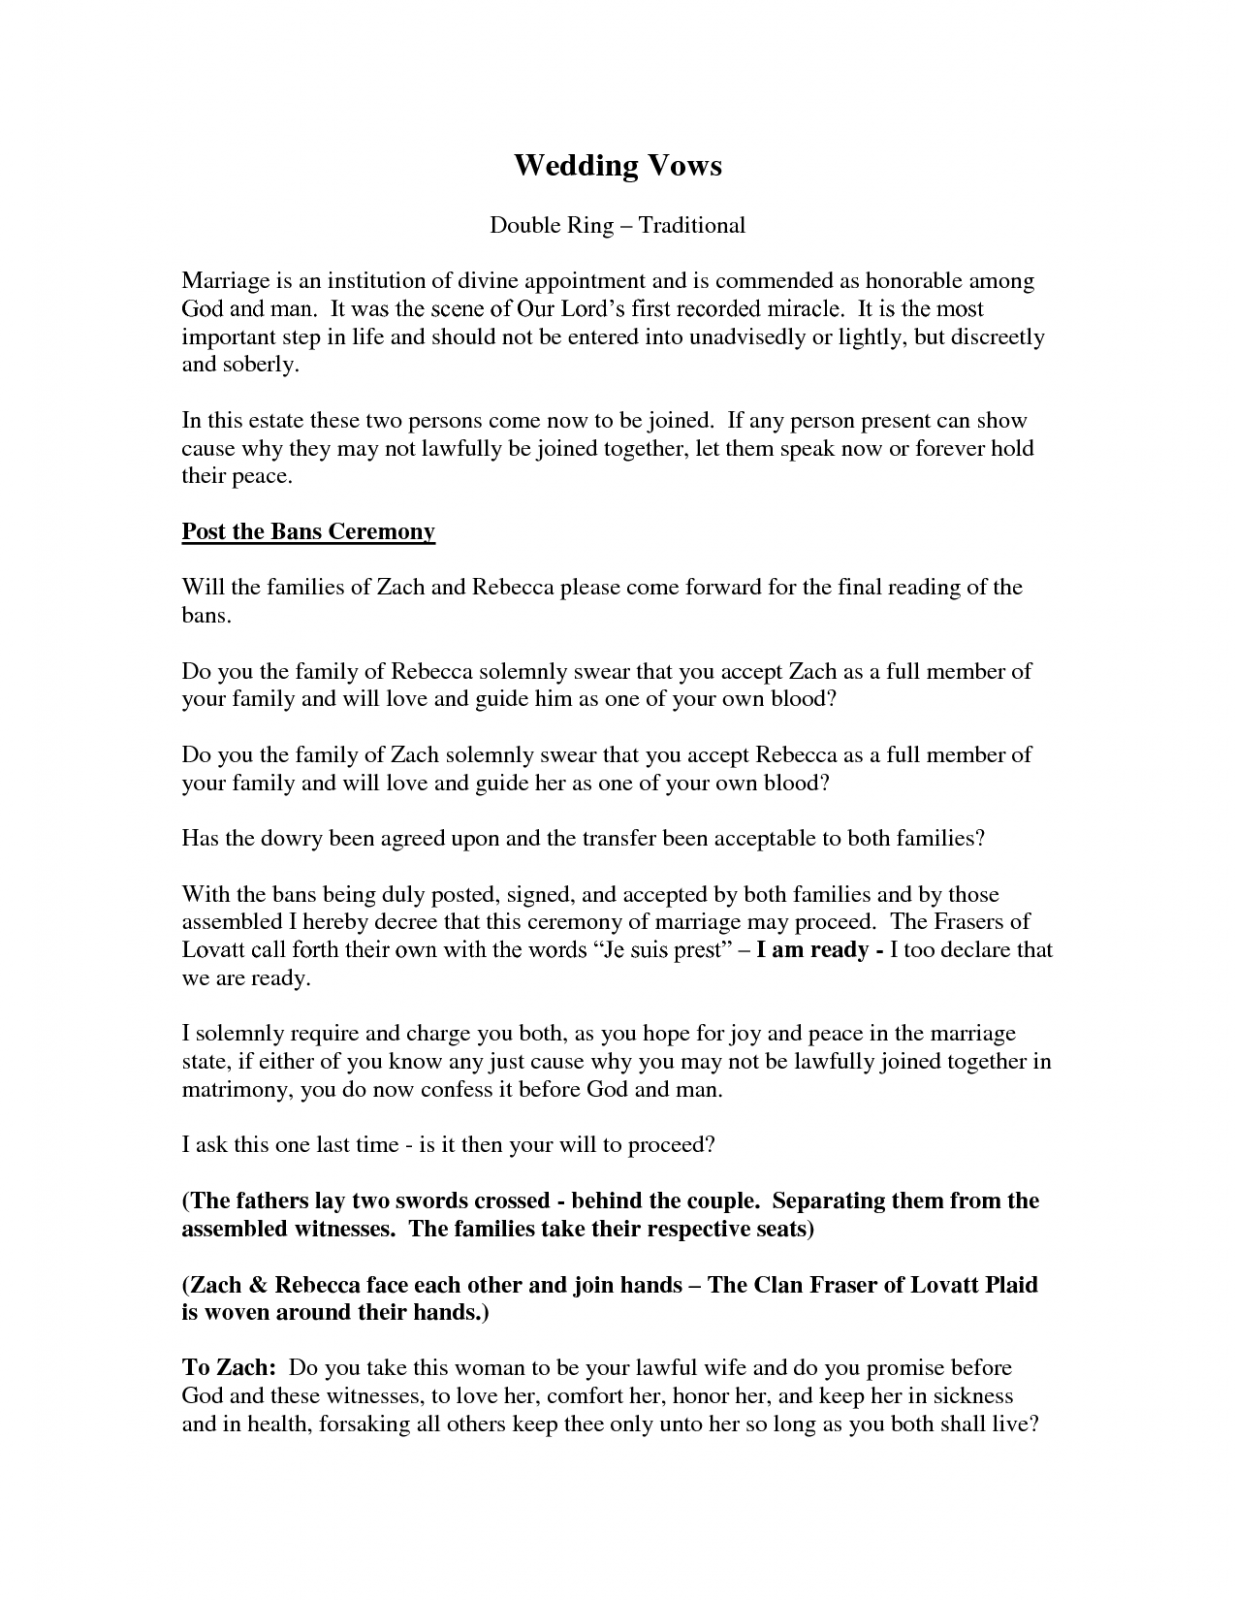 Wedding Vows Non Denominational Mini Bridal Nontraditional Weddingceremonyreadings Traditional Wedding Vows Wedding Vows Examples Wedding Vows